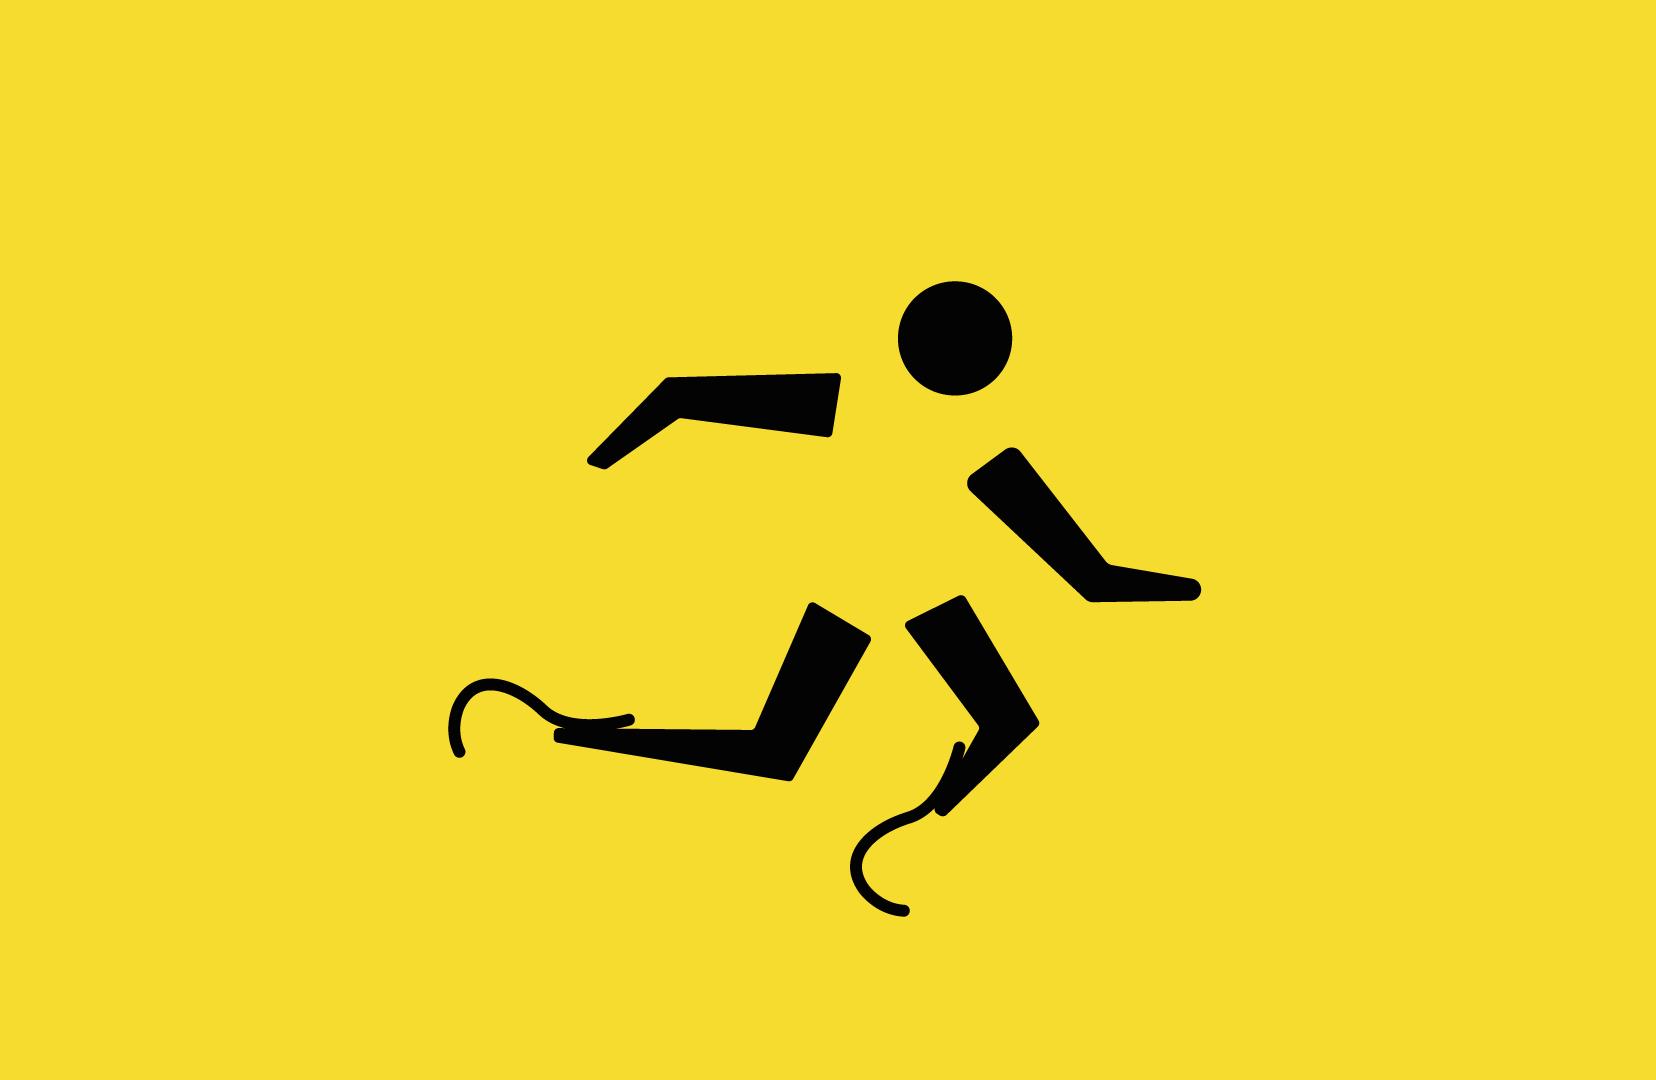 A imagem mostra o pictograma da modalidade atletismo